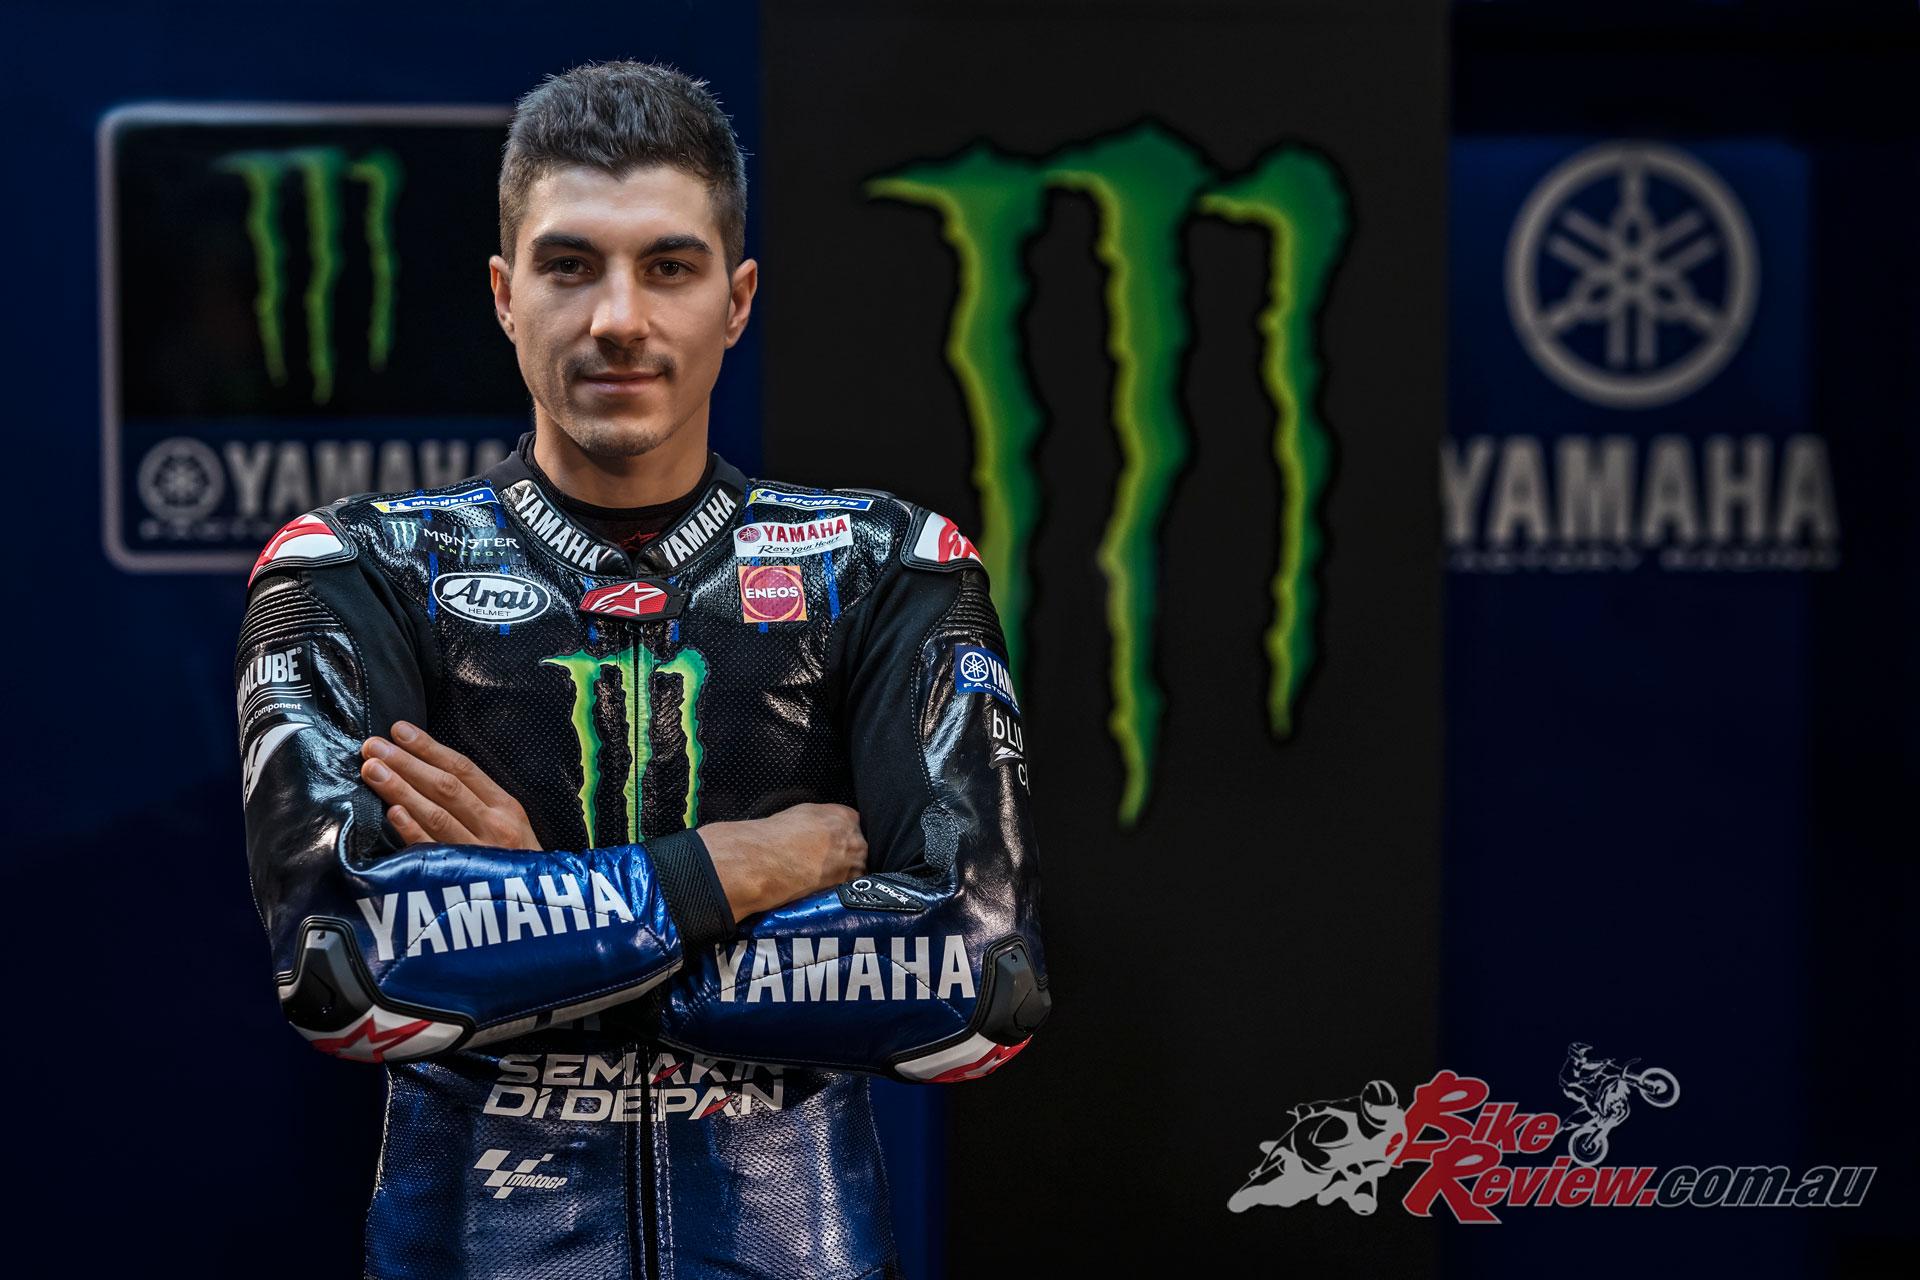 2019 Monster Energy Yamaha MotoGP Team - Maverick Vinales